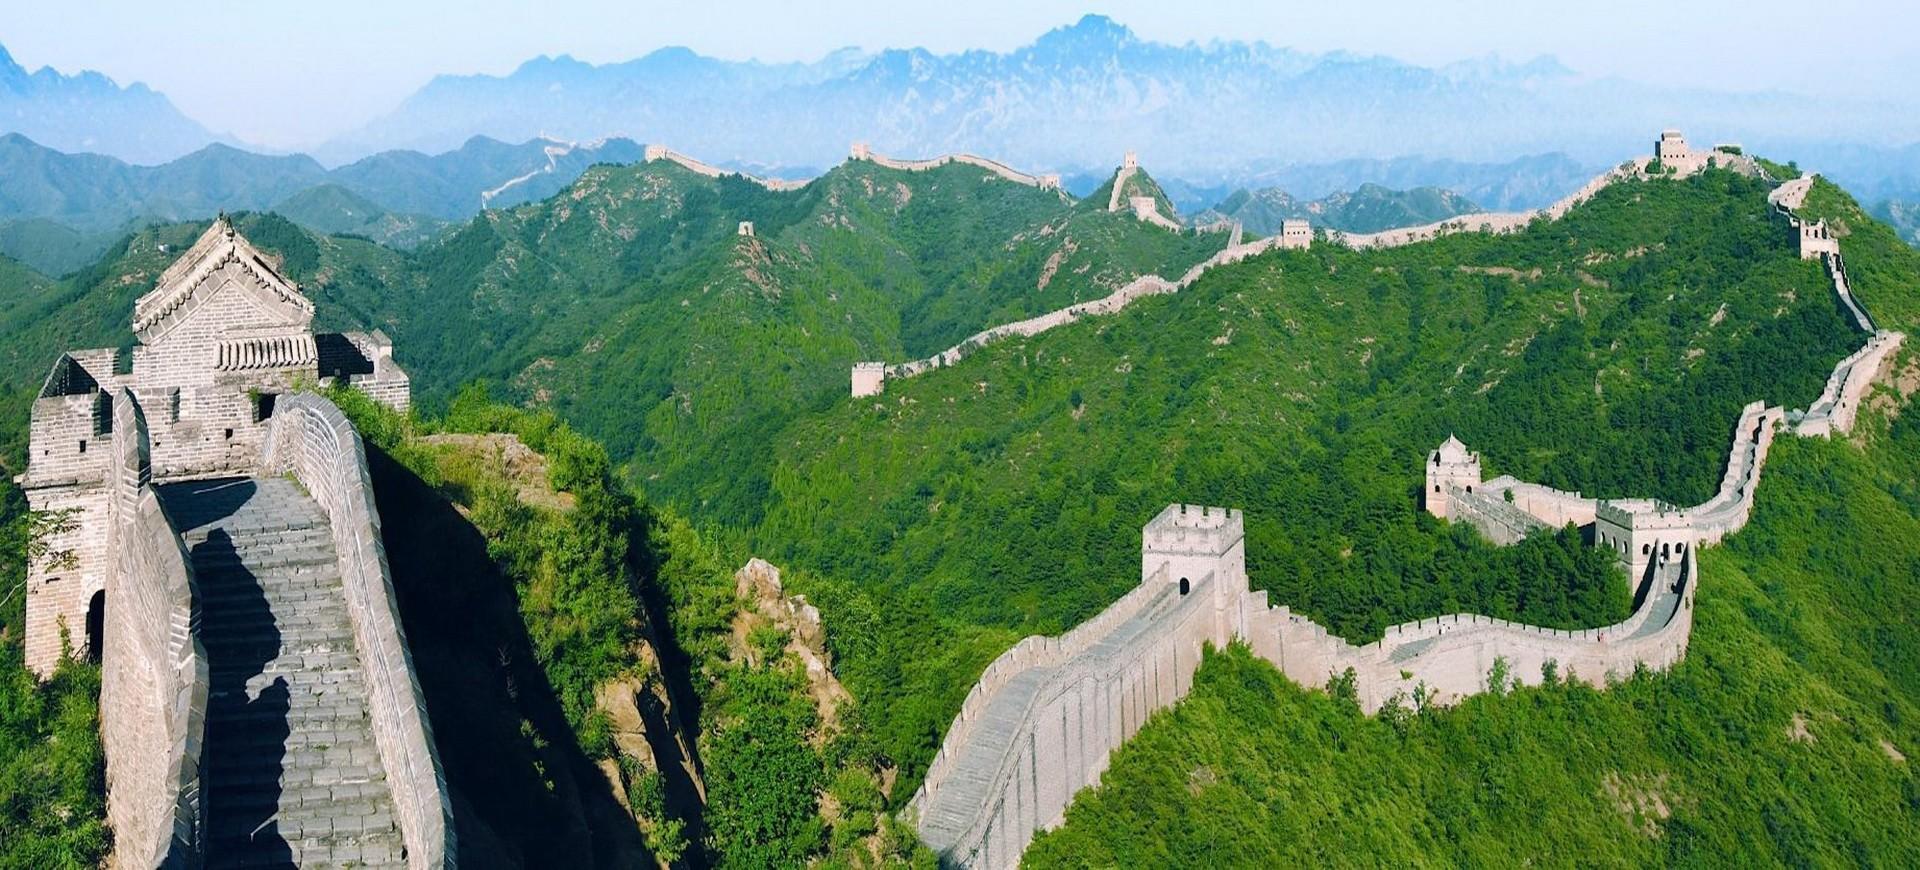 Chine Pékin Grande Muraille